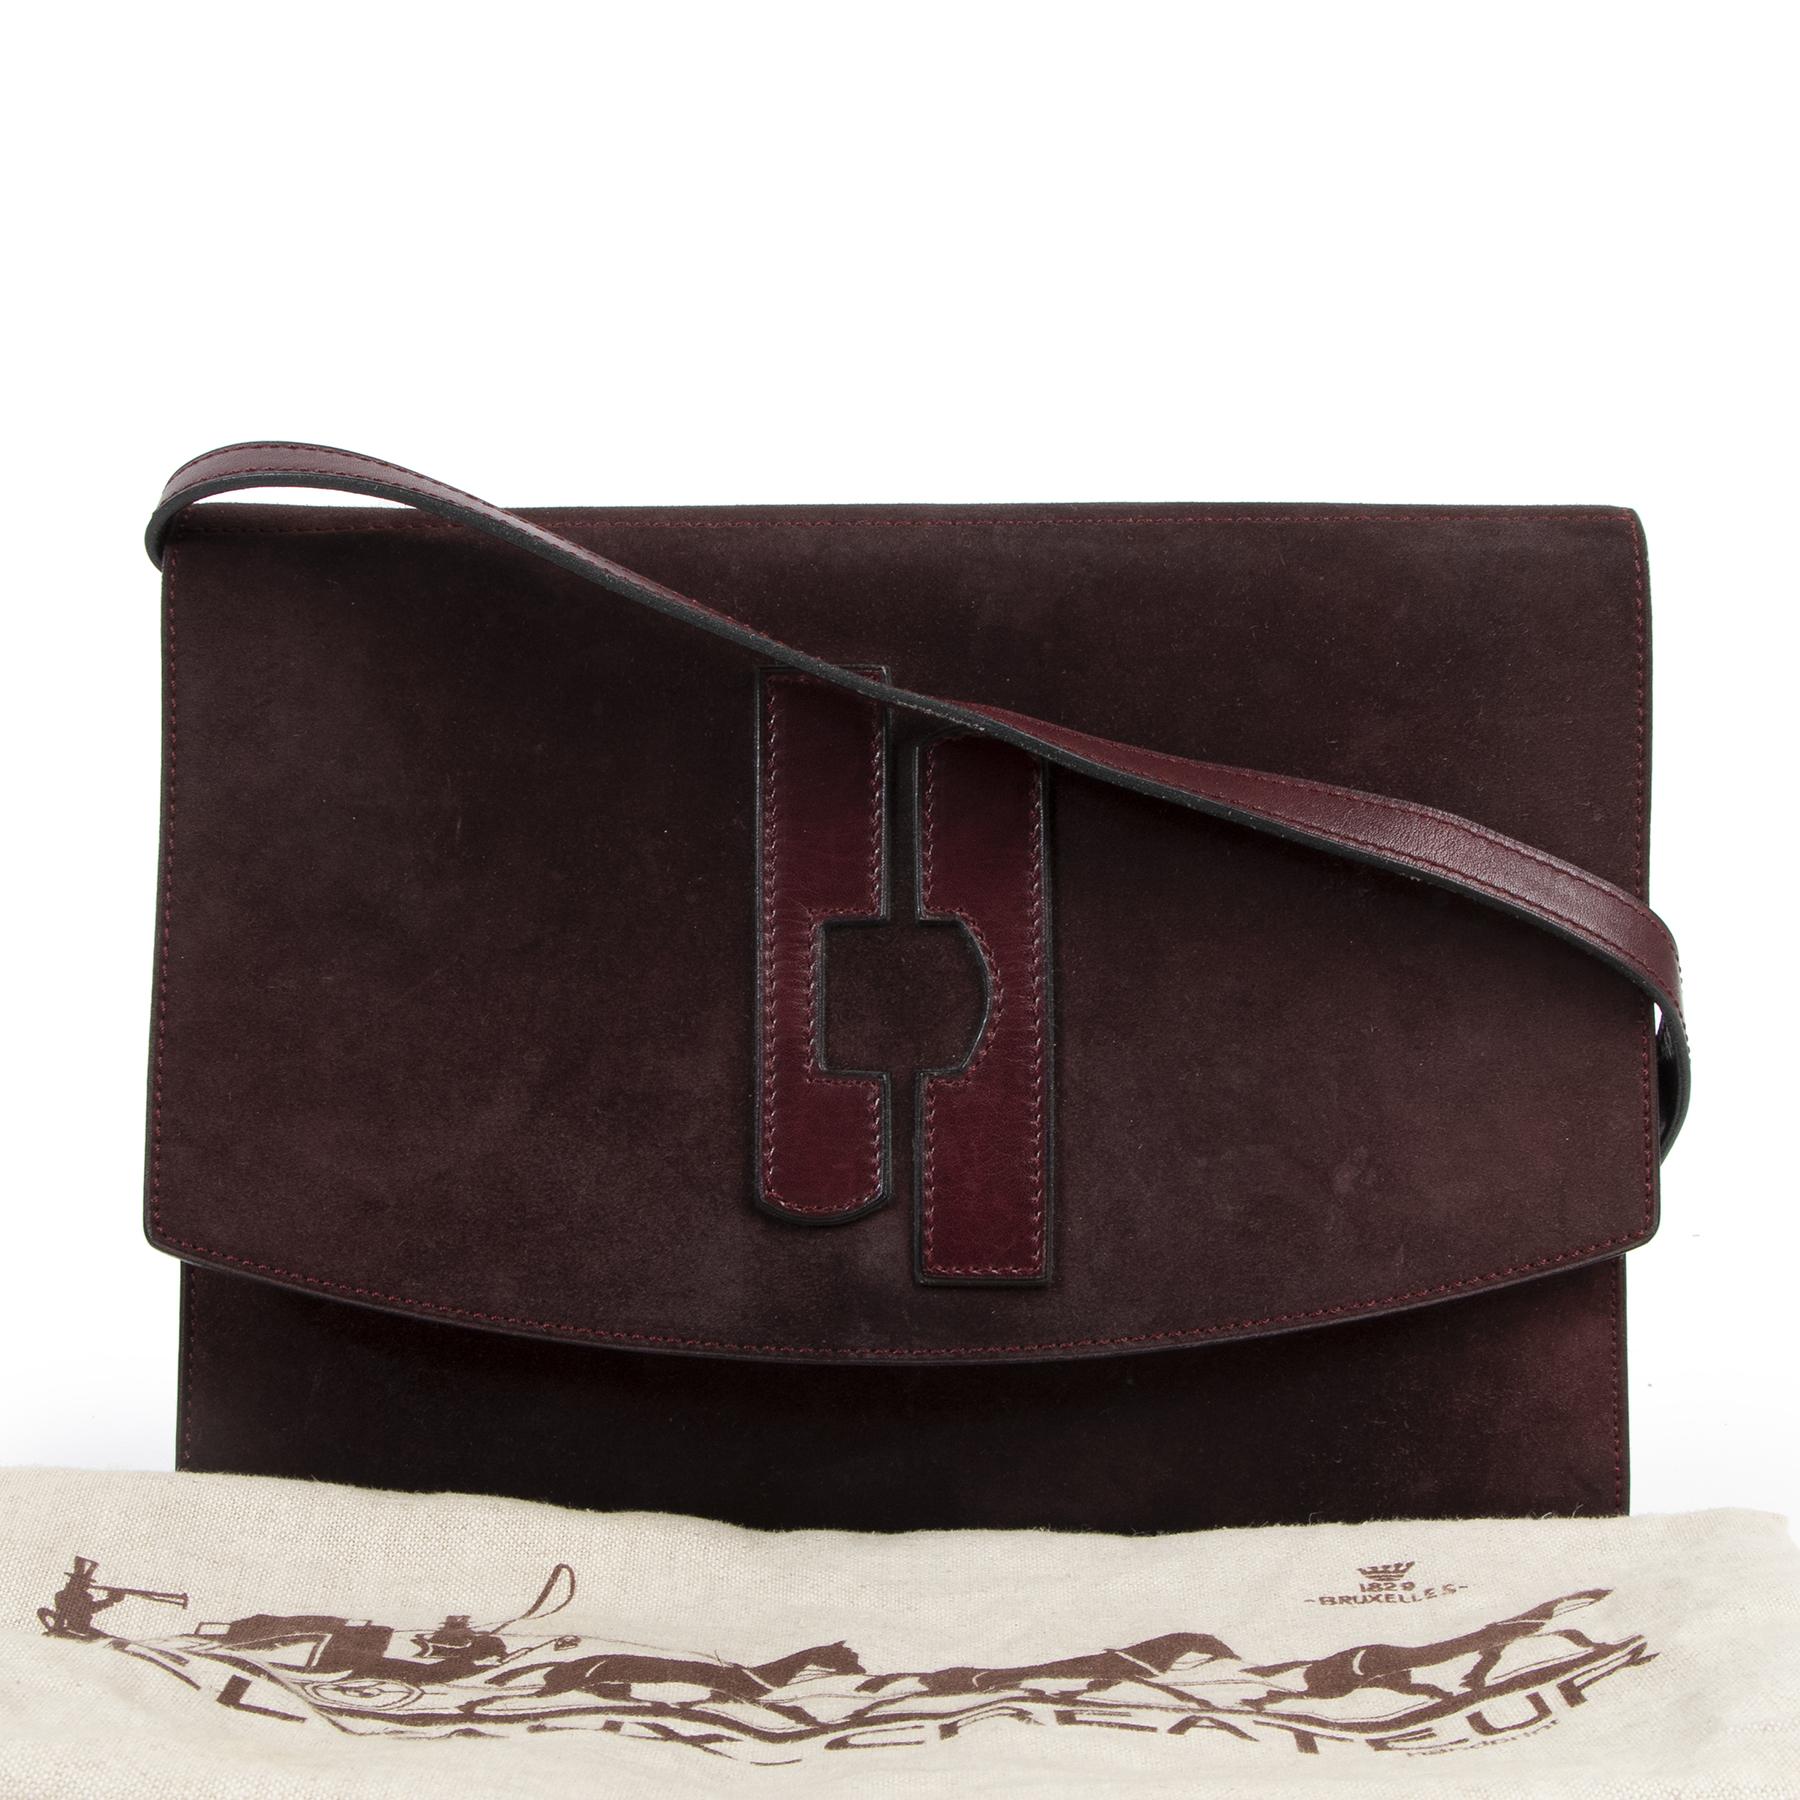 Delvaux Vintage Burgundy Suede Crossbody Bag